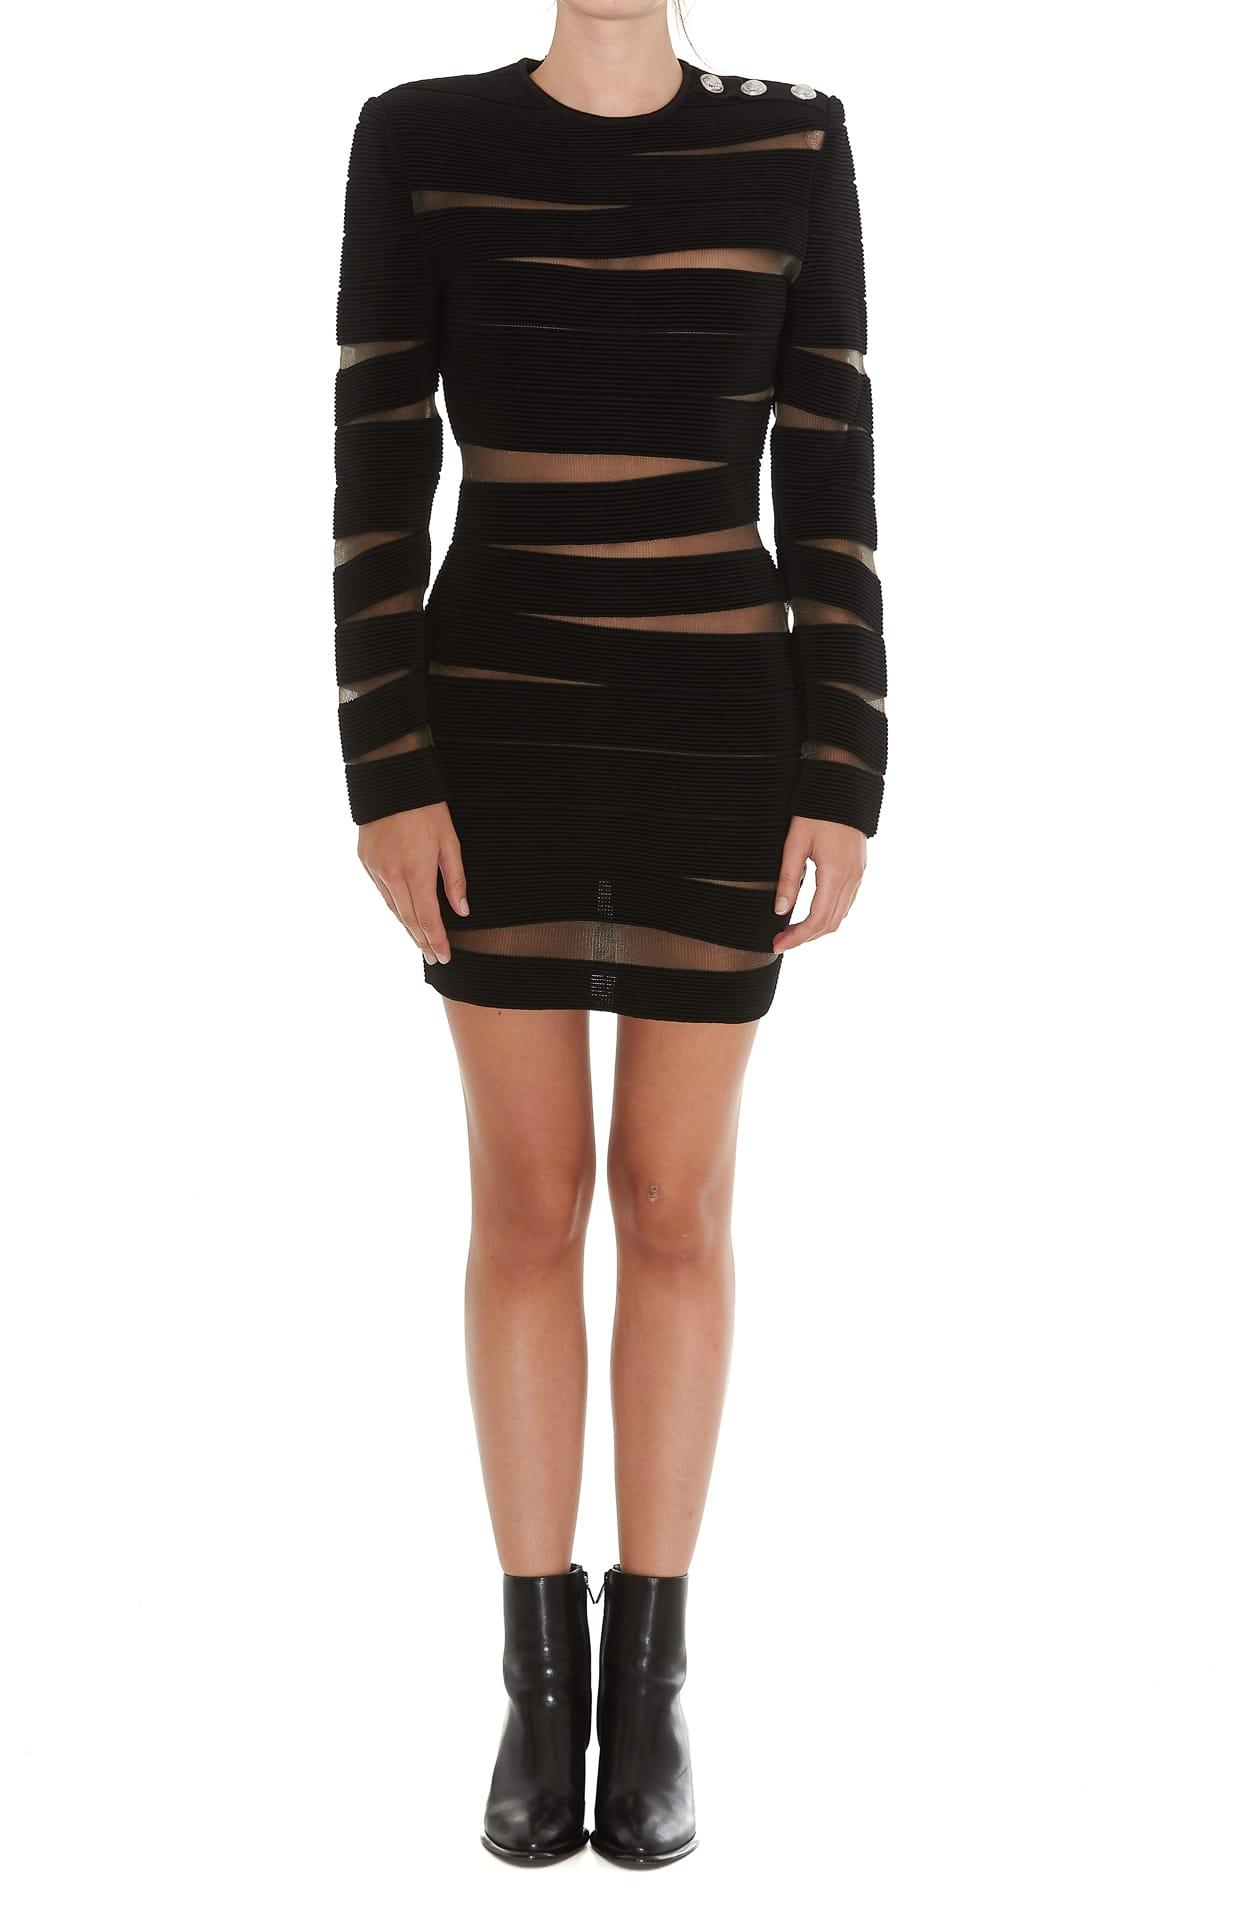 Balmain Open Knit Mini Dress